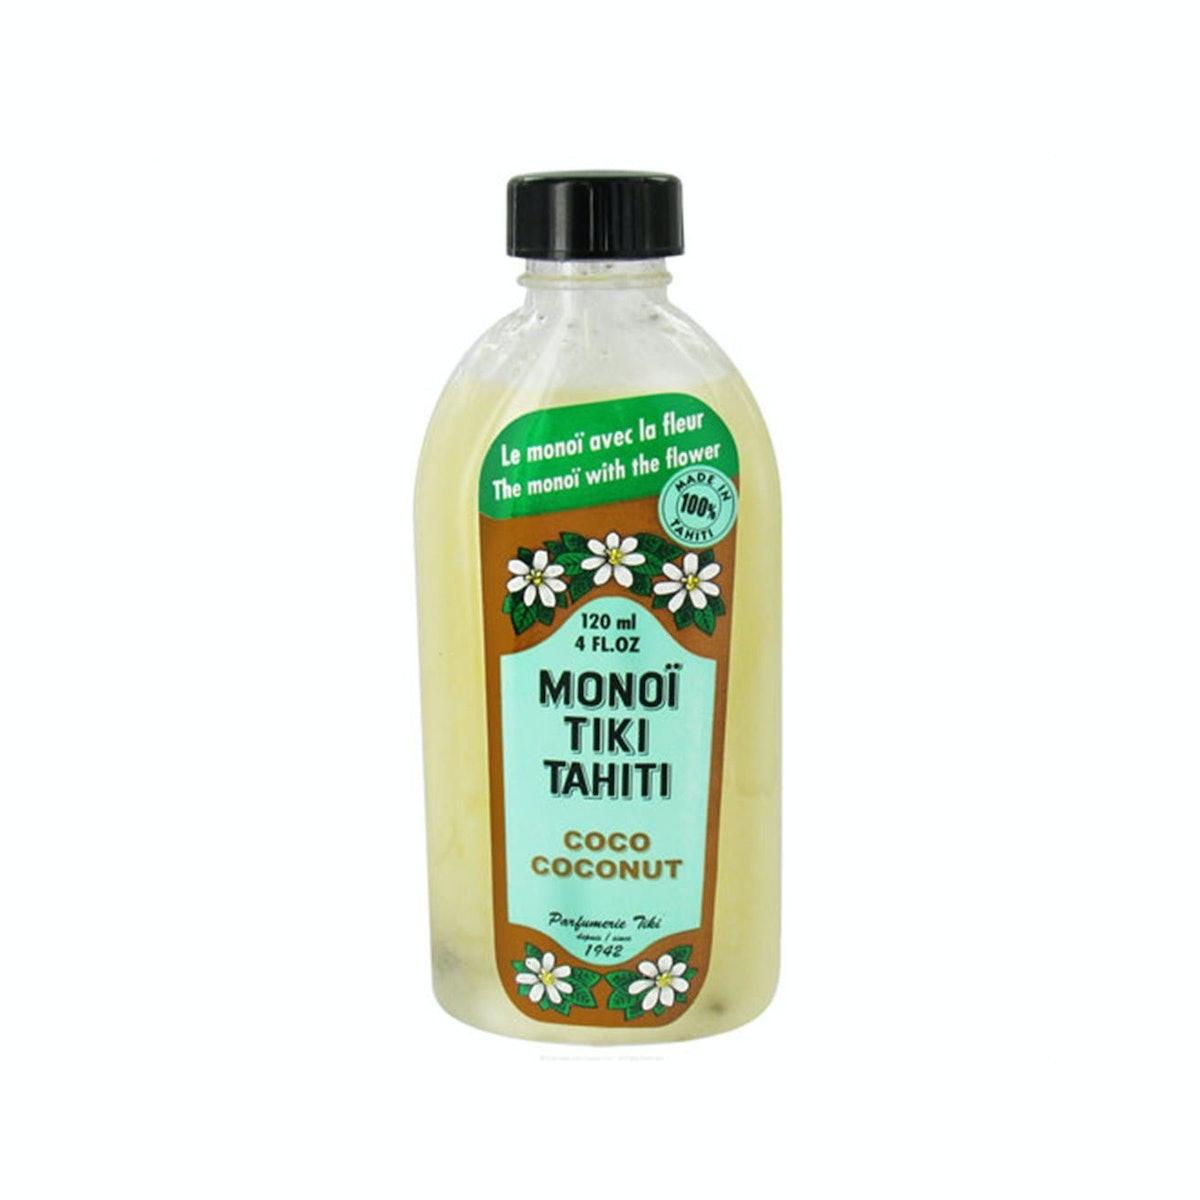 Monoi Tiare Tahiti Coconut Oil